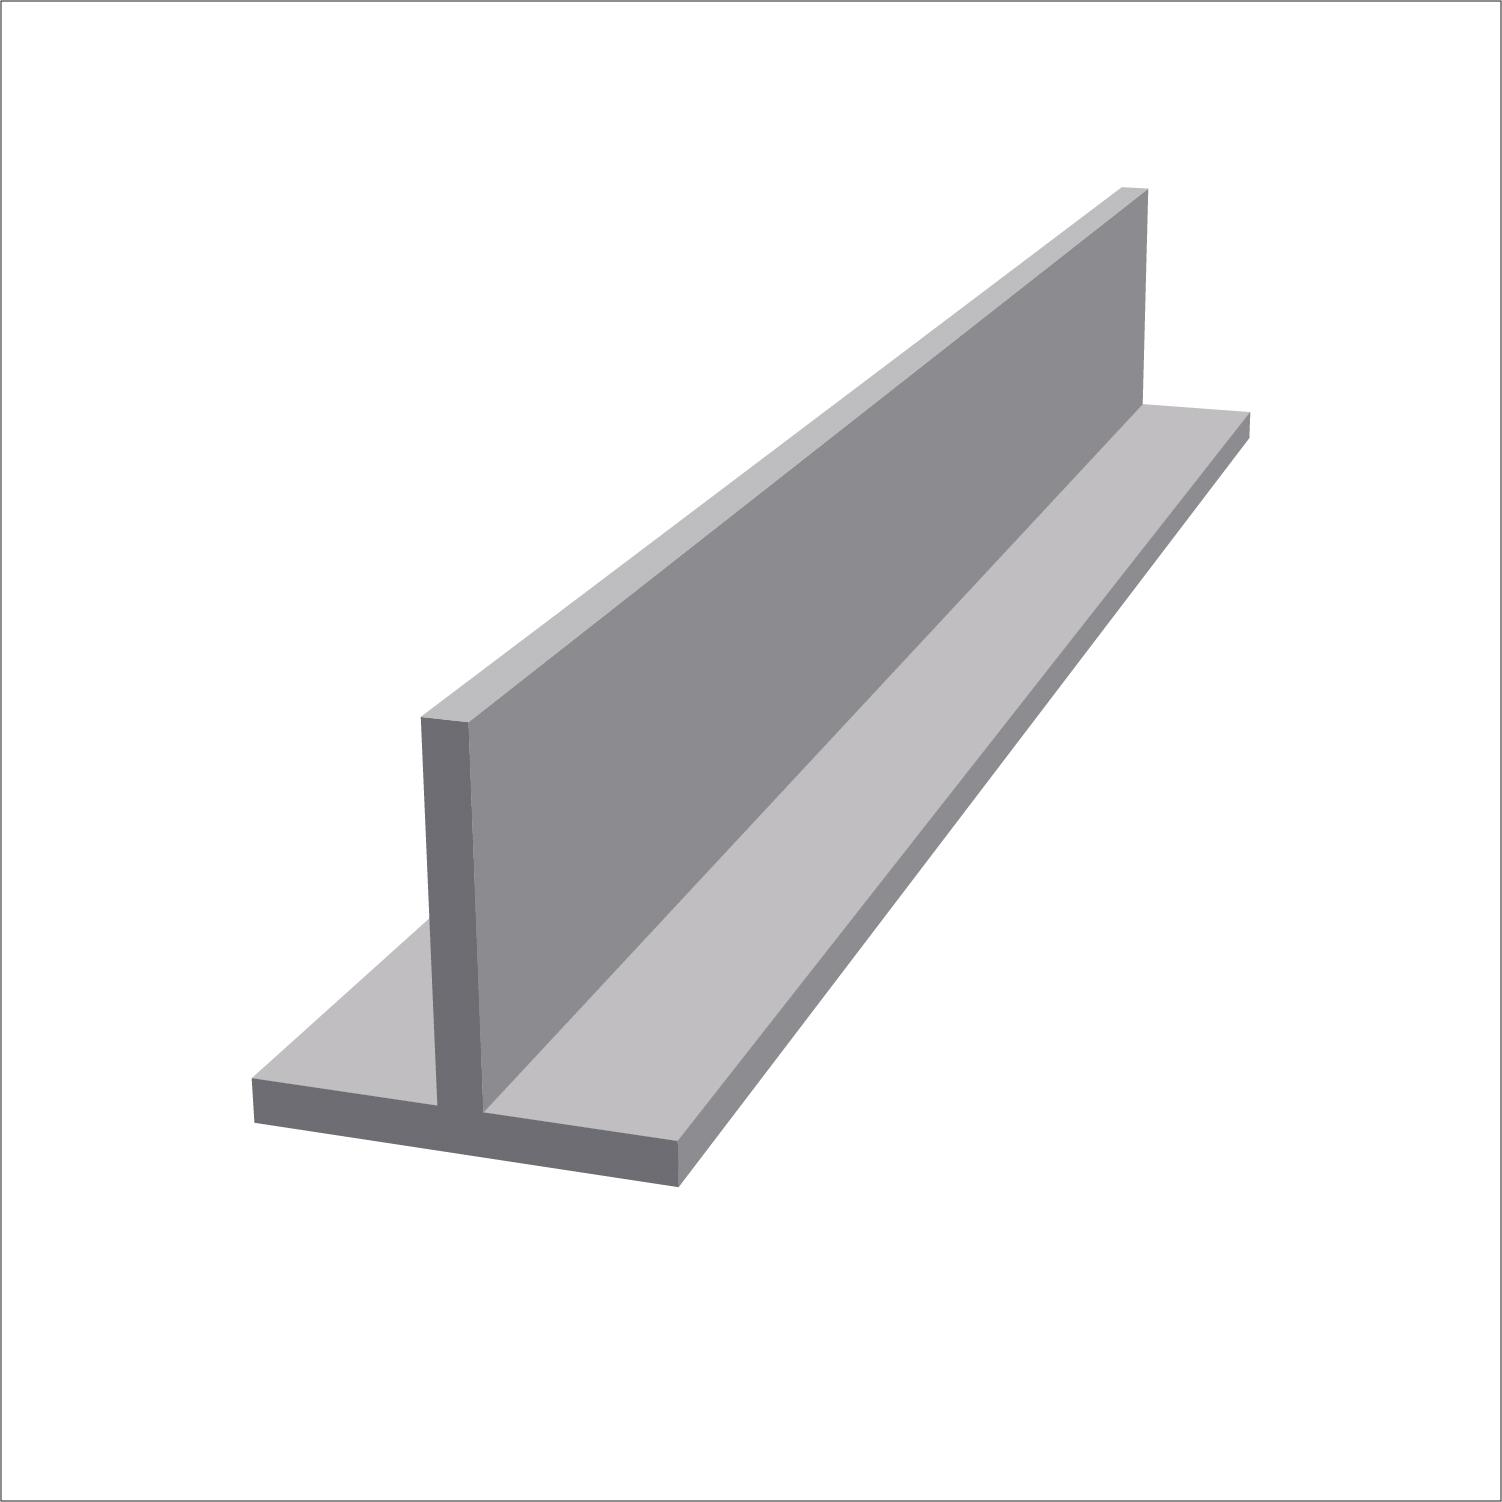 aluminium square tube rectangular section size many lengths 2 m to 5 m ebay. Black Bedroom Furniture Sets. Home Design Ideas